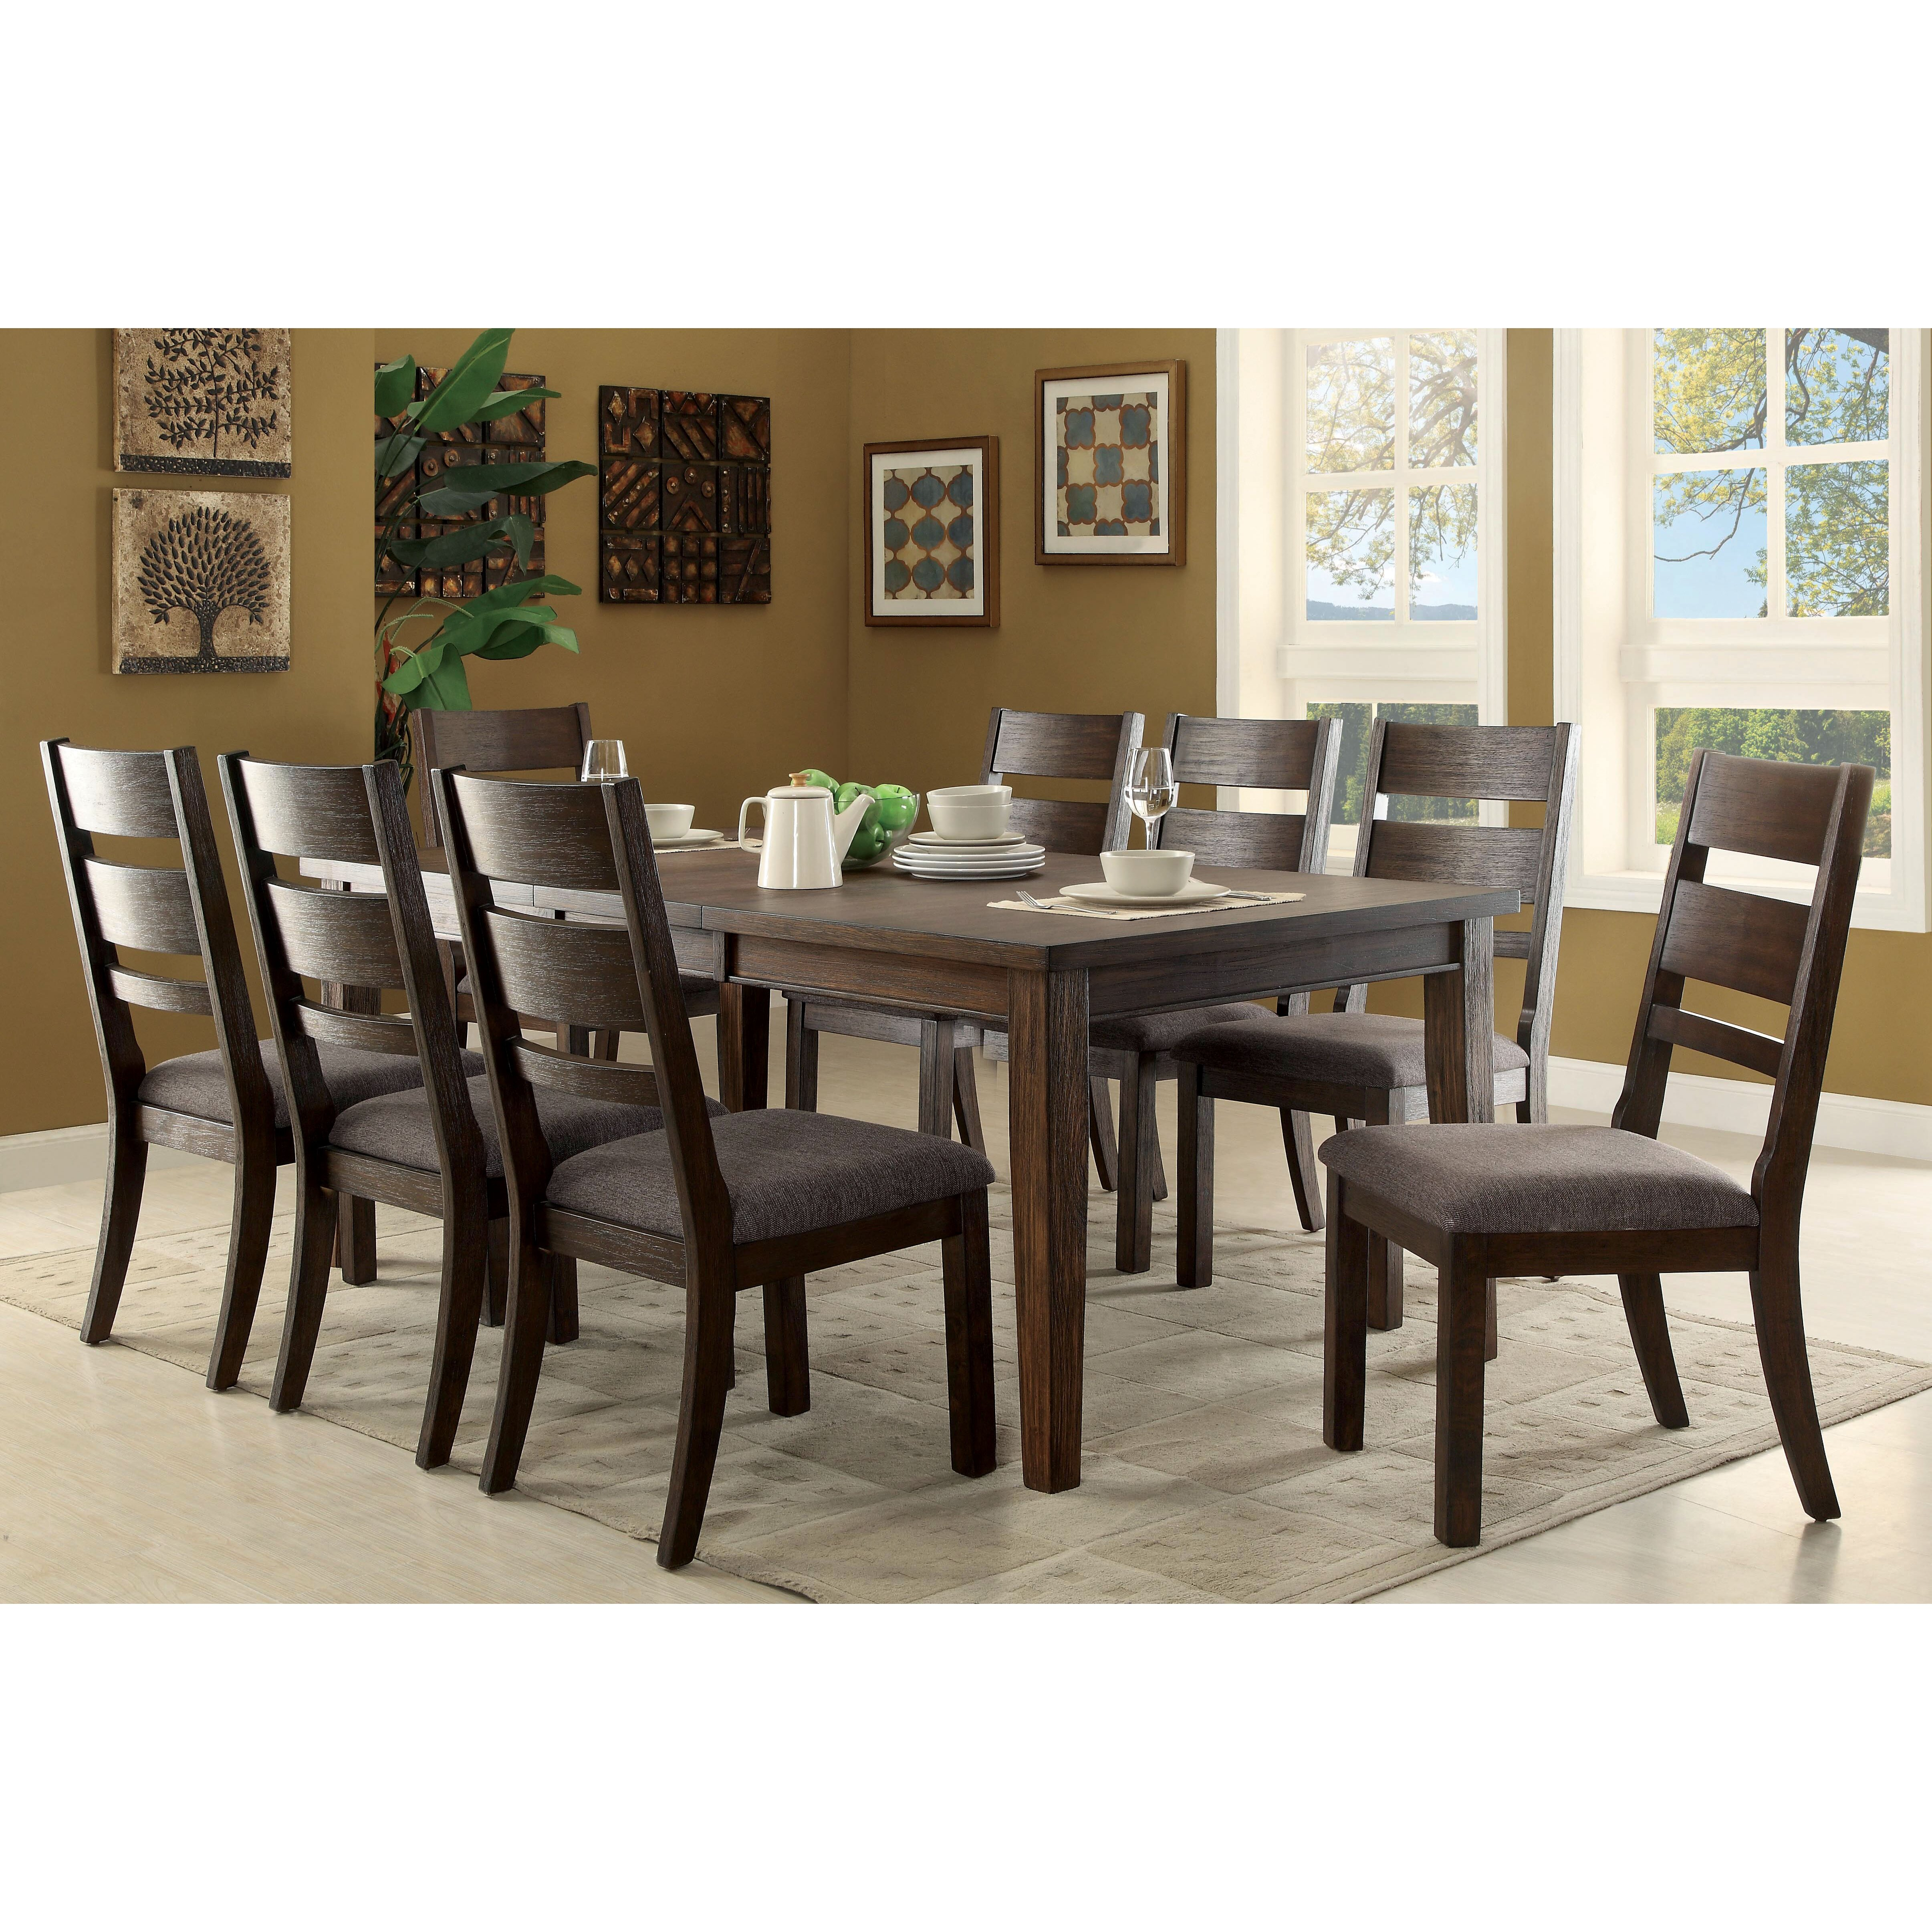 Latitude run rozelle 9 piece dining set wayfair for Dining room tables 9 piece